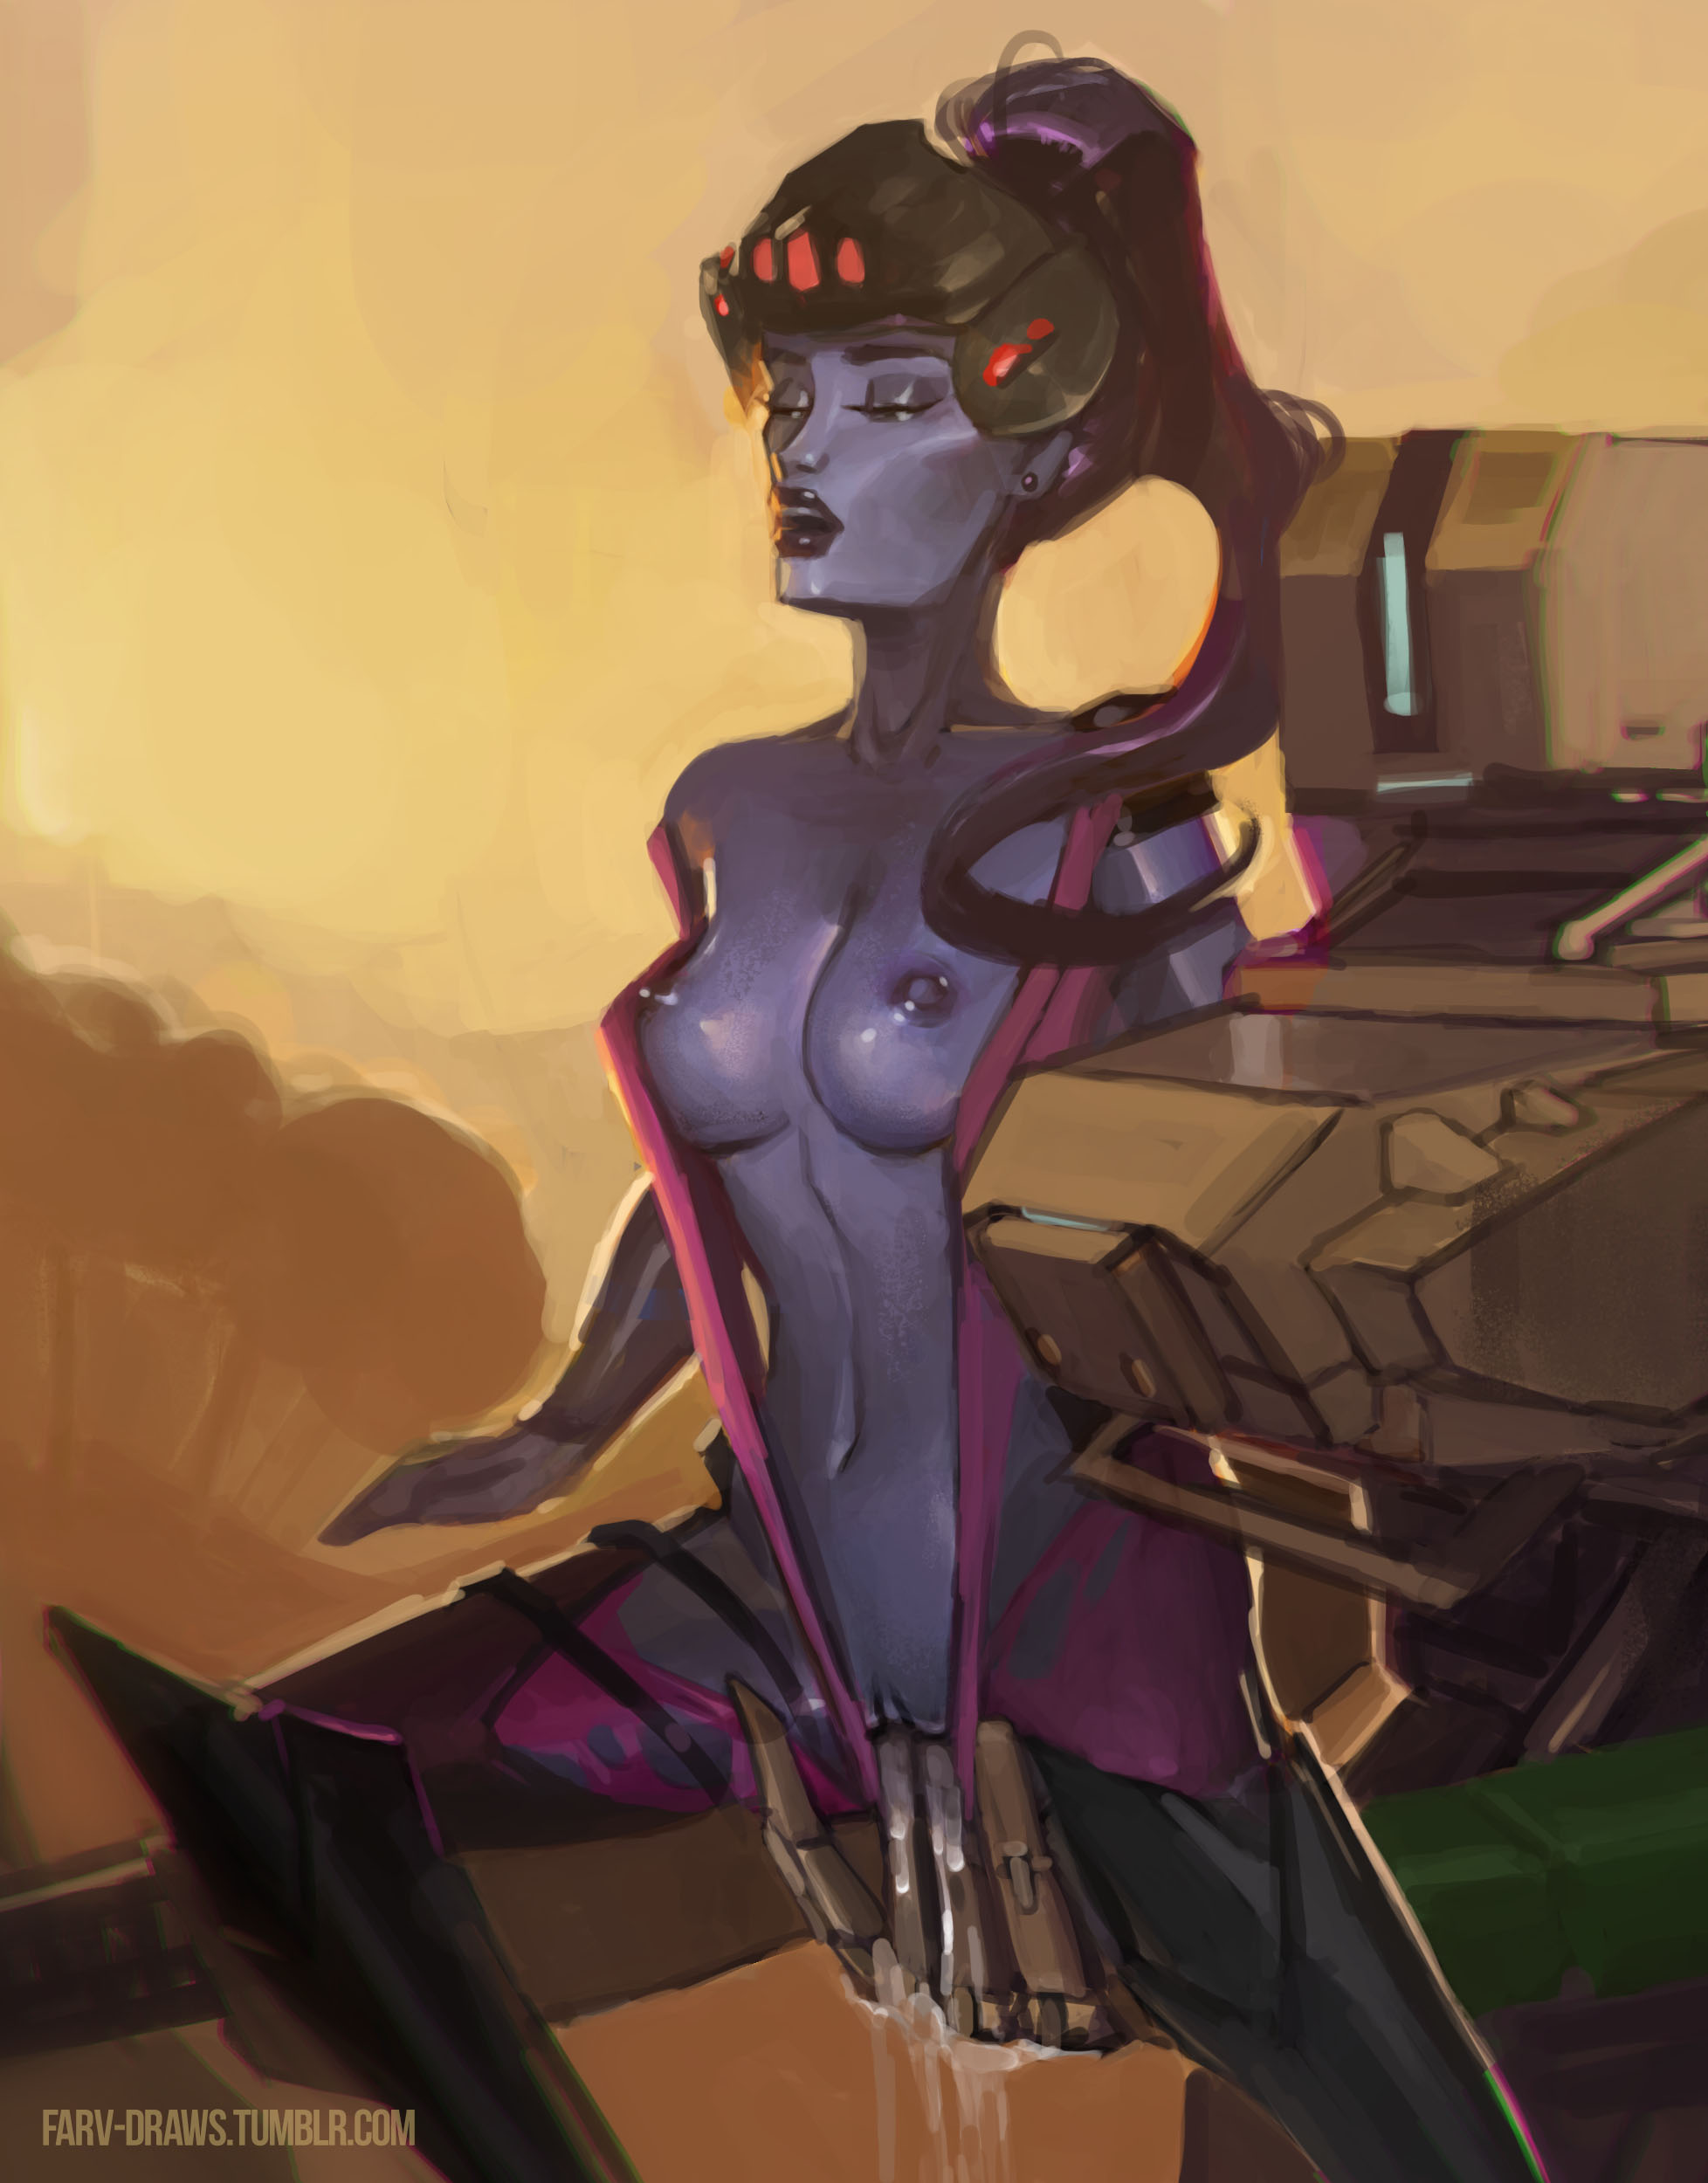 2080777 - Bastion Overlook Widowmaker farv